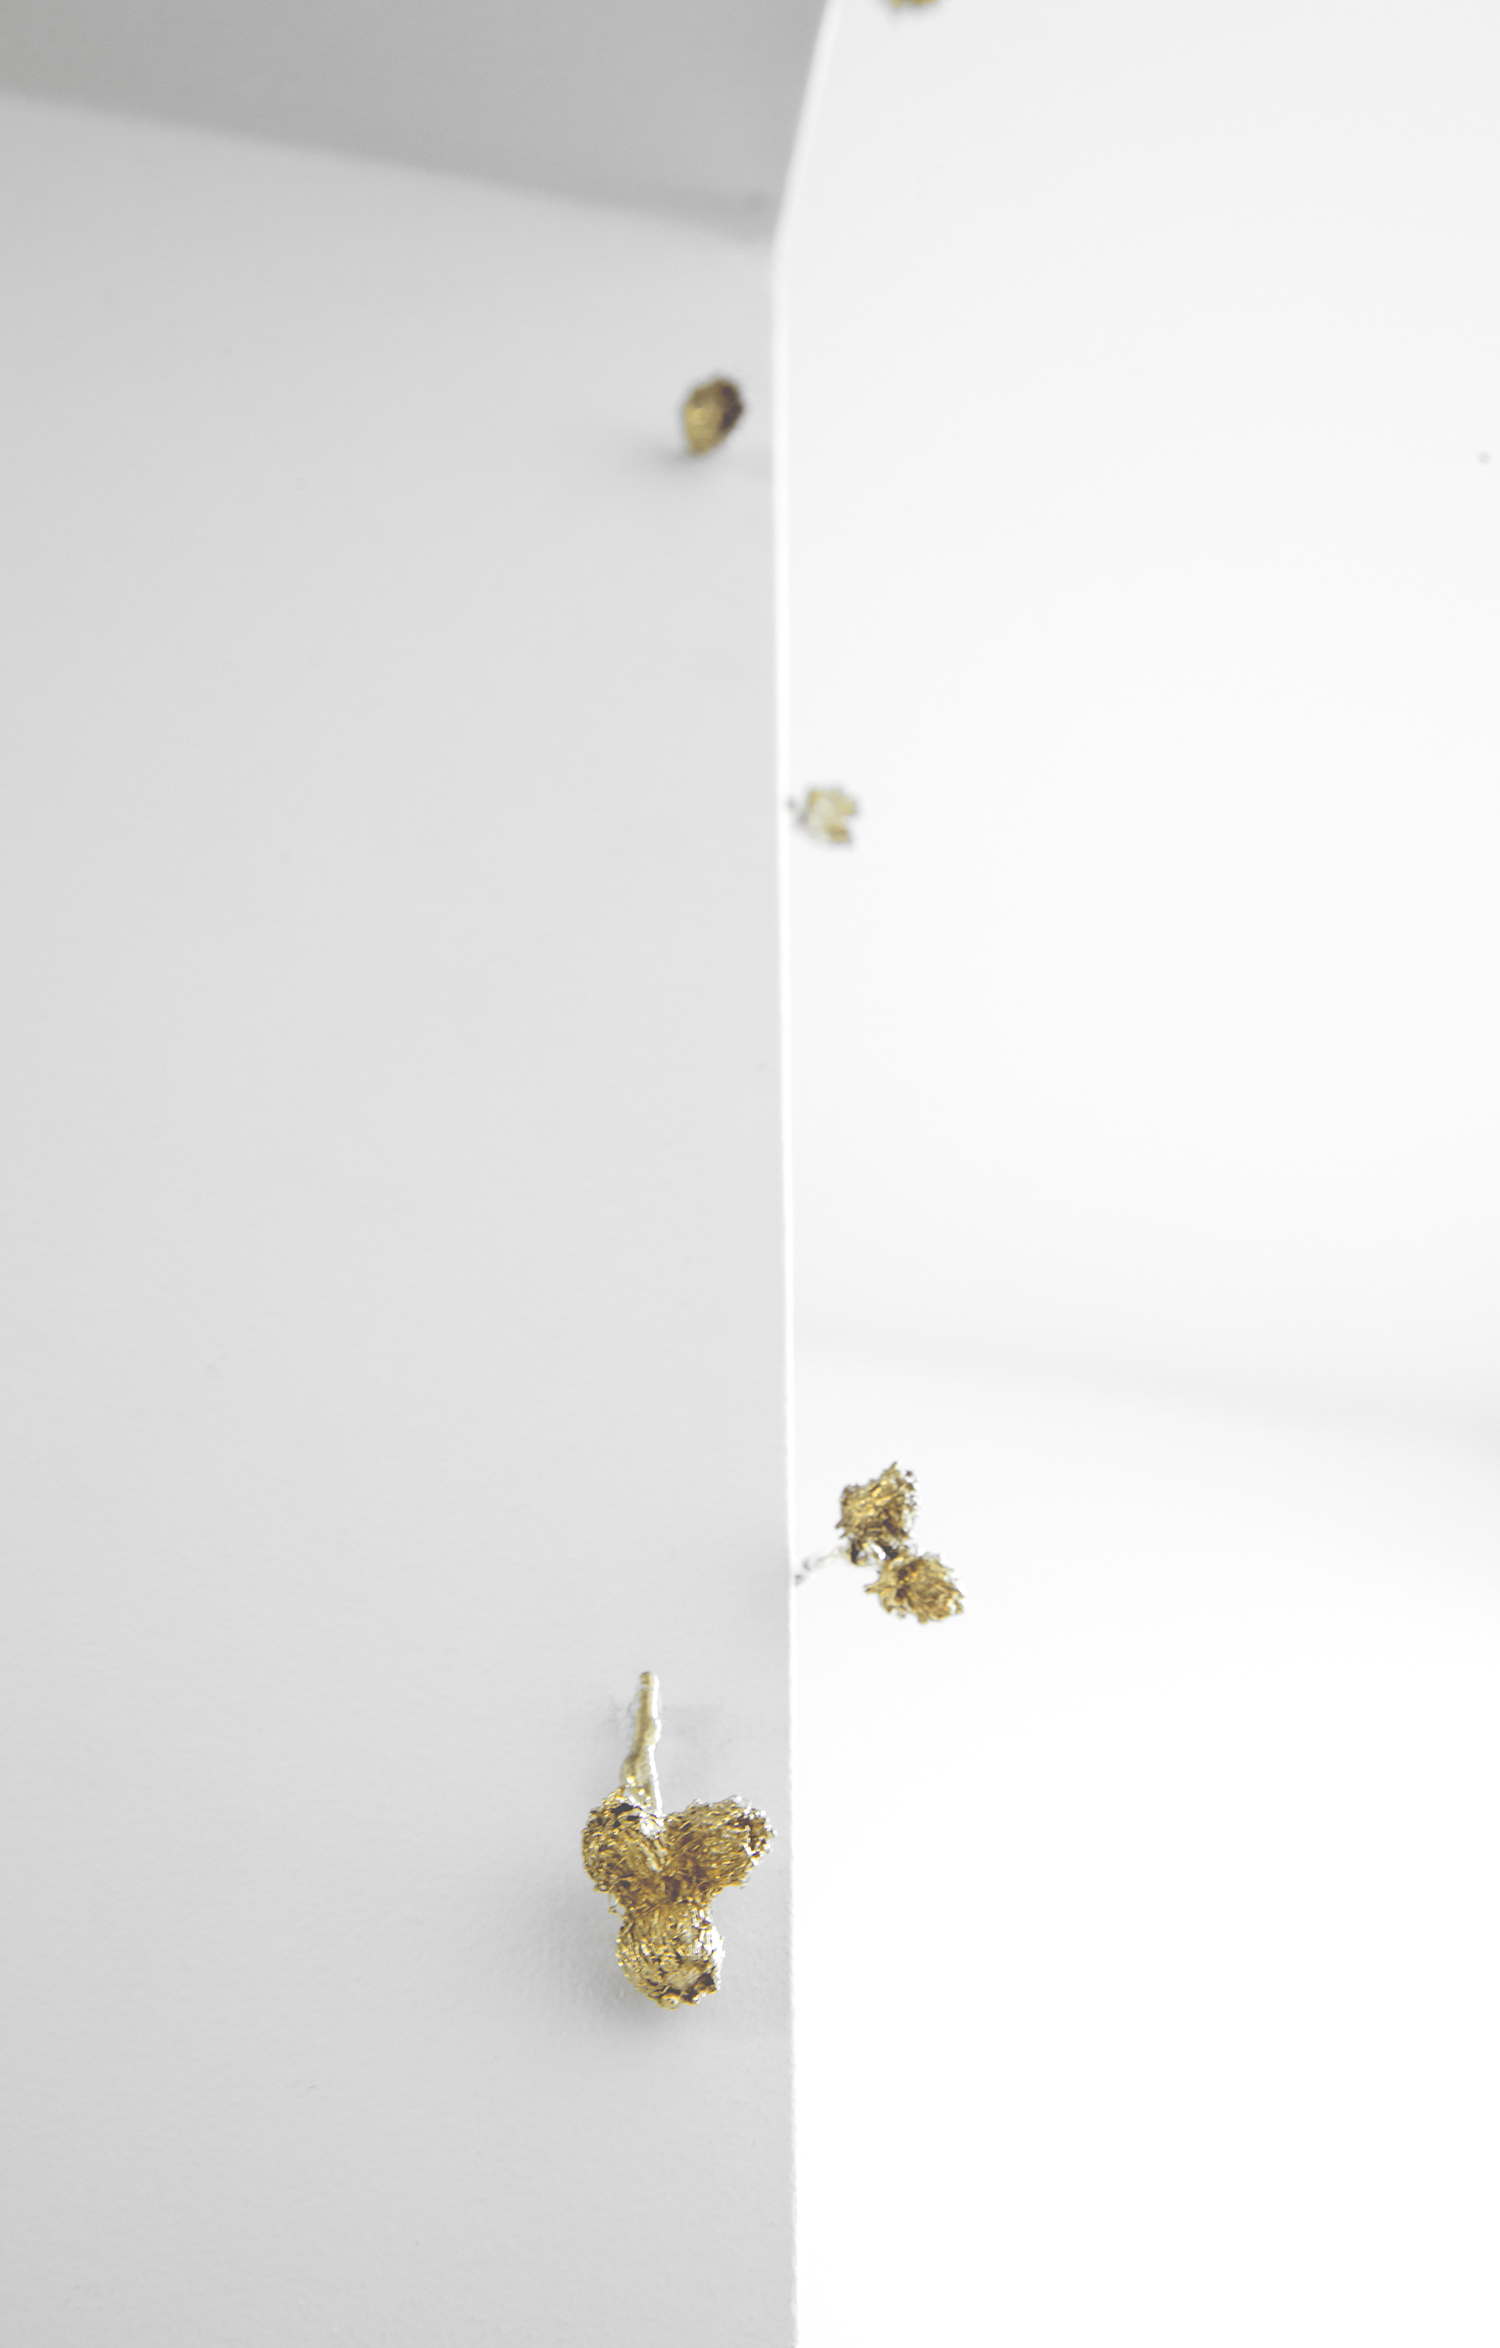 burs  2017 10k solid gold, copper mount 1:1 scale